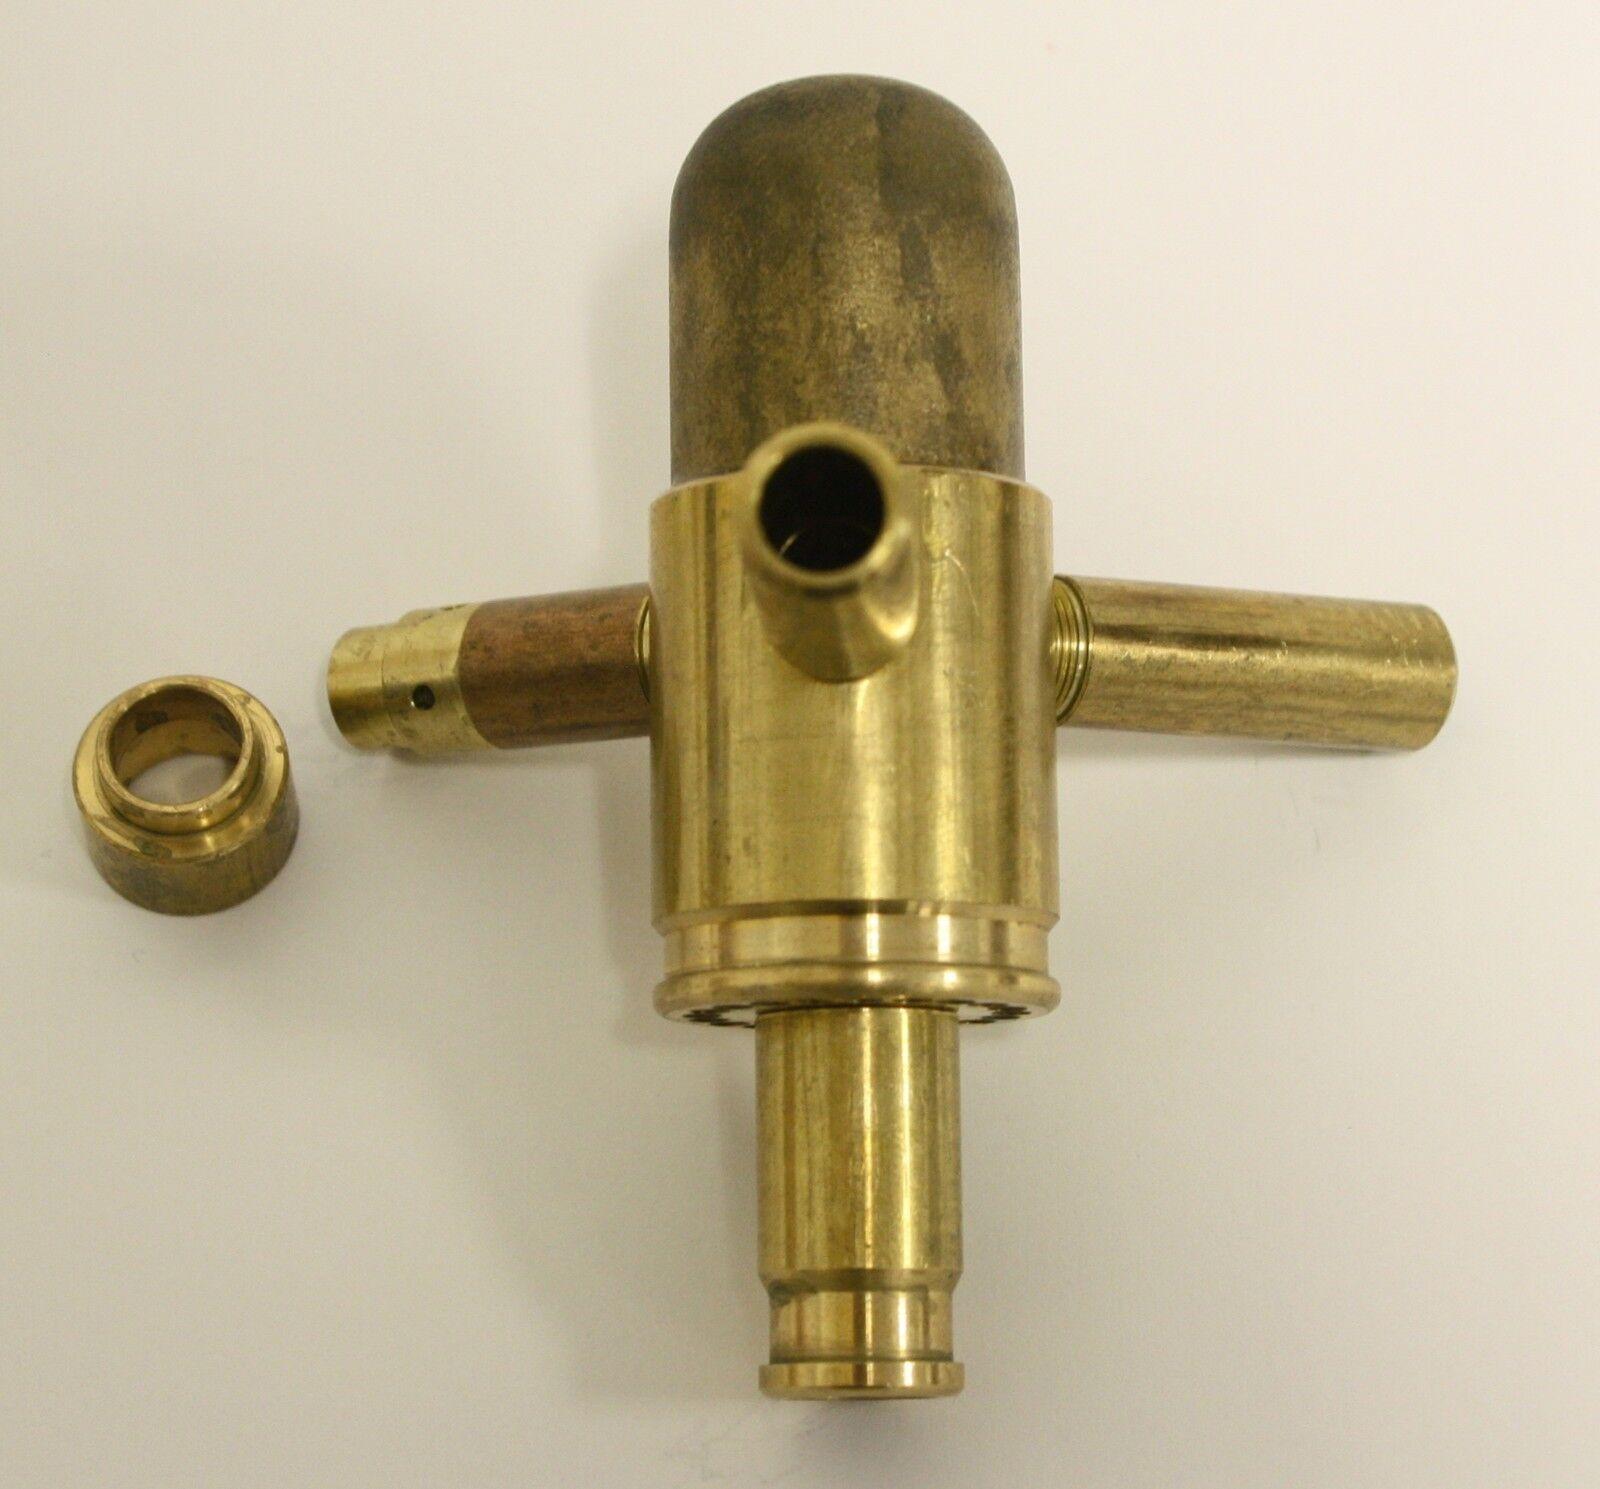 Tilley  218 Burner for X246 Guardsman Stormlight Lantern   Tilly Lamp